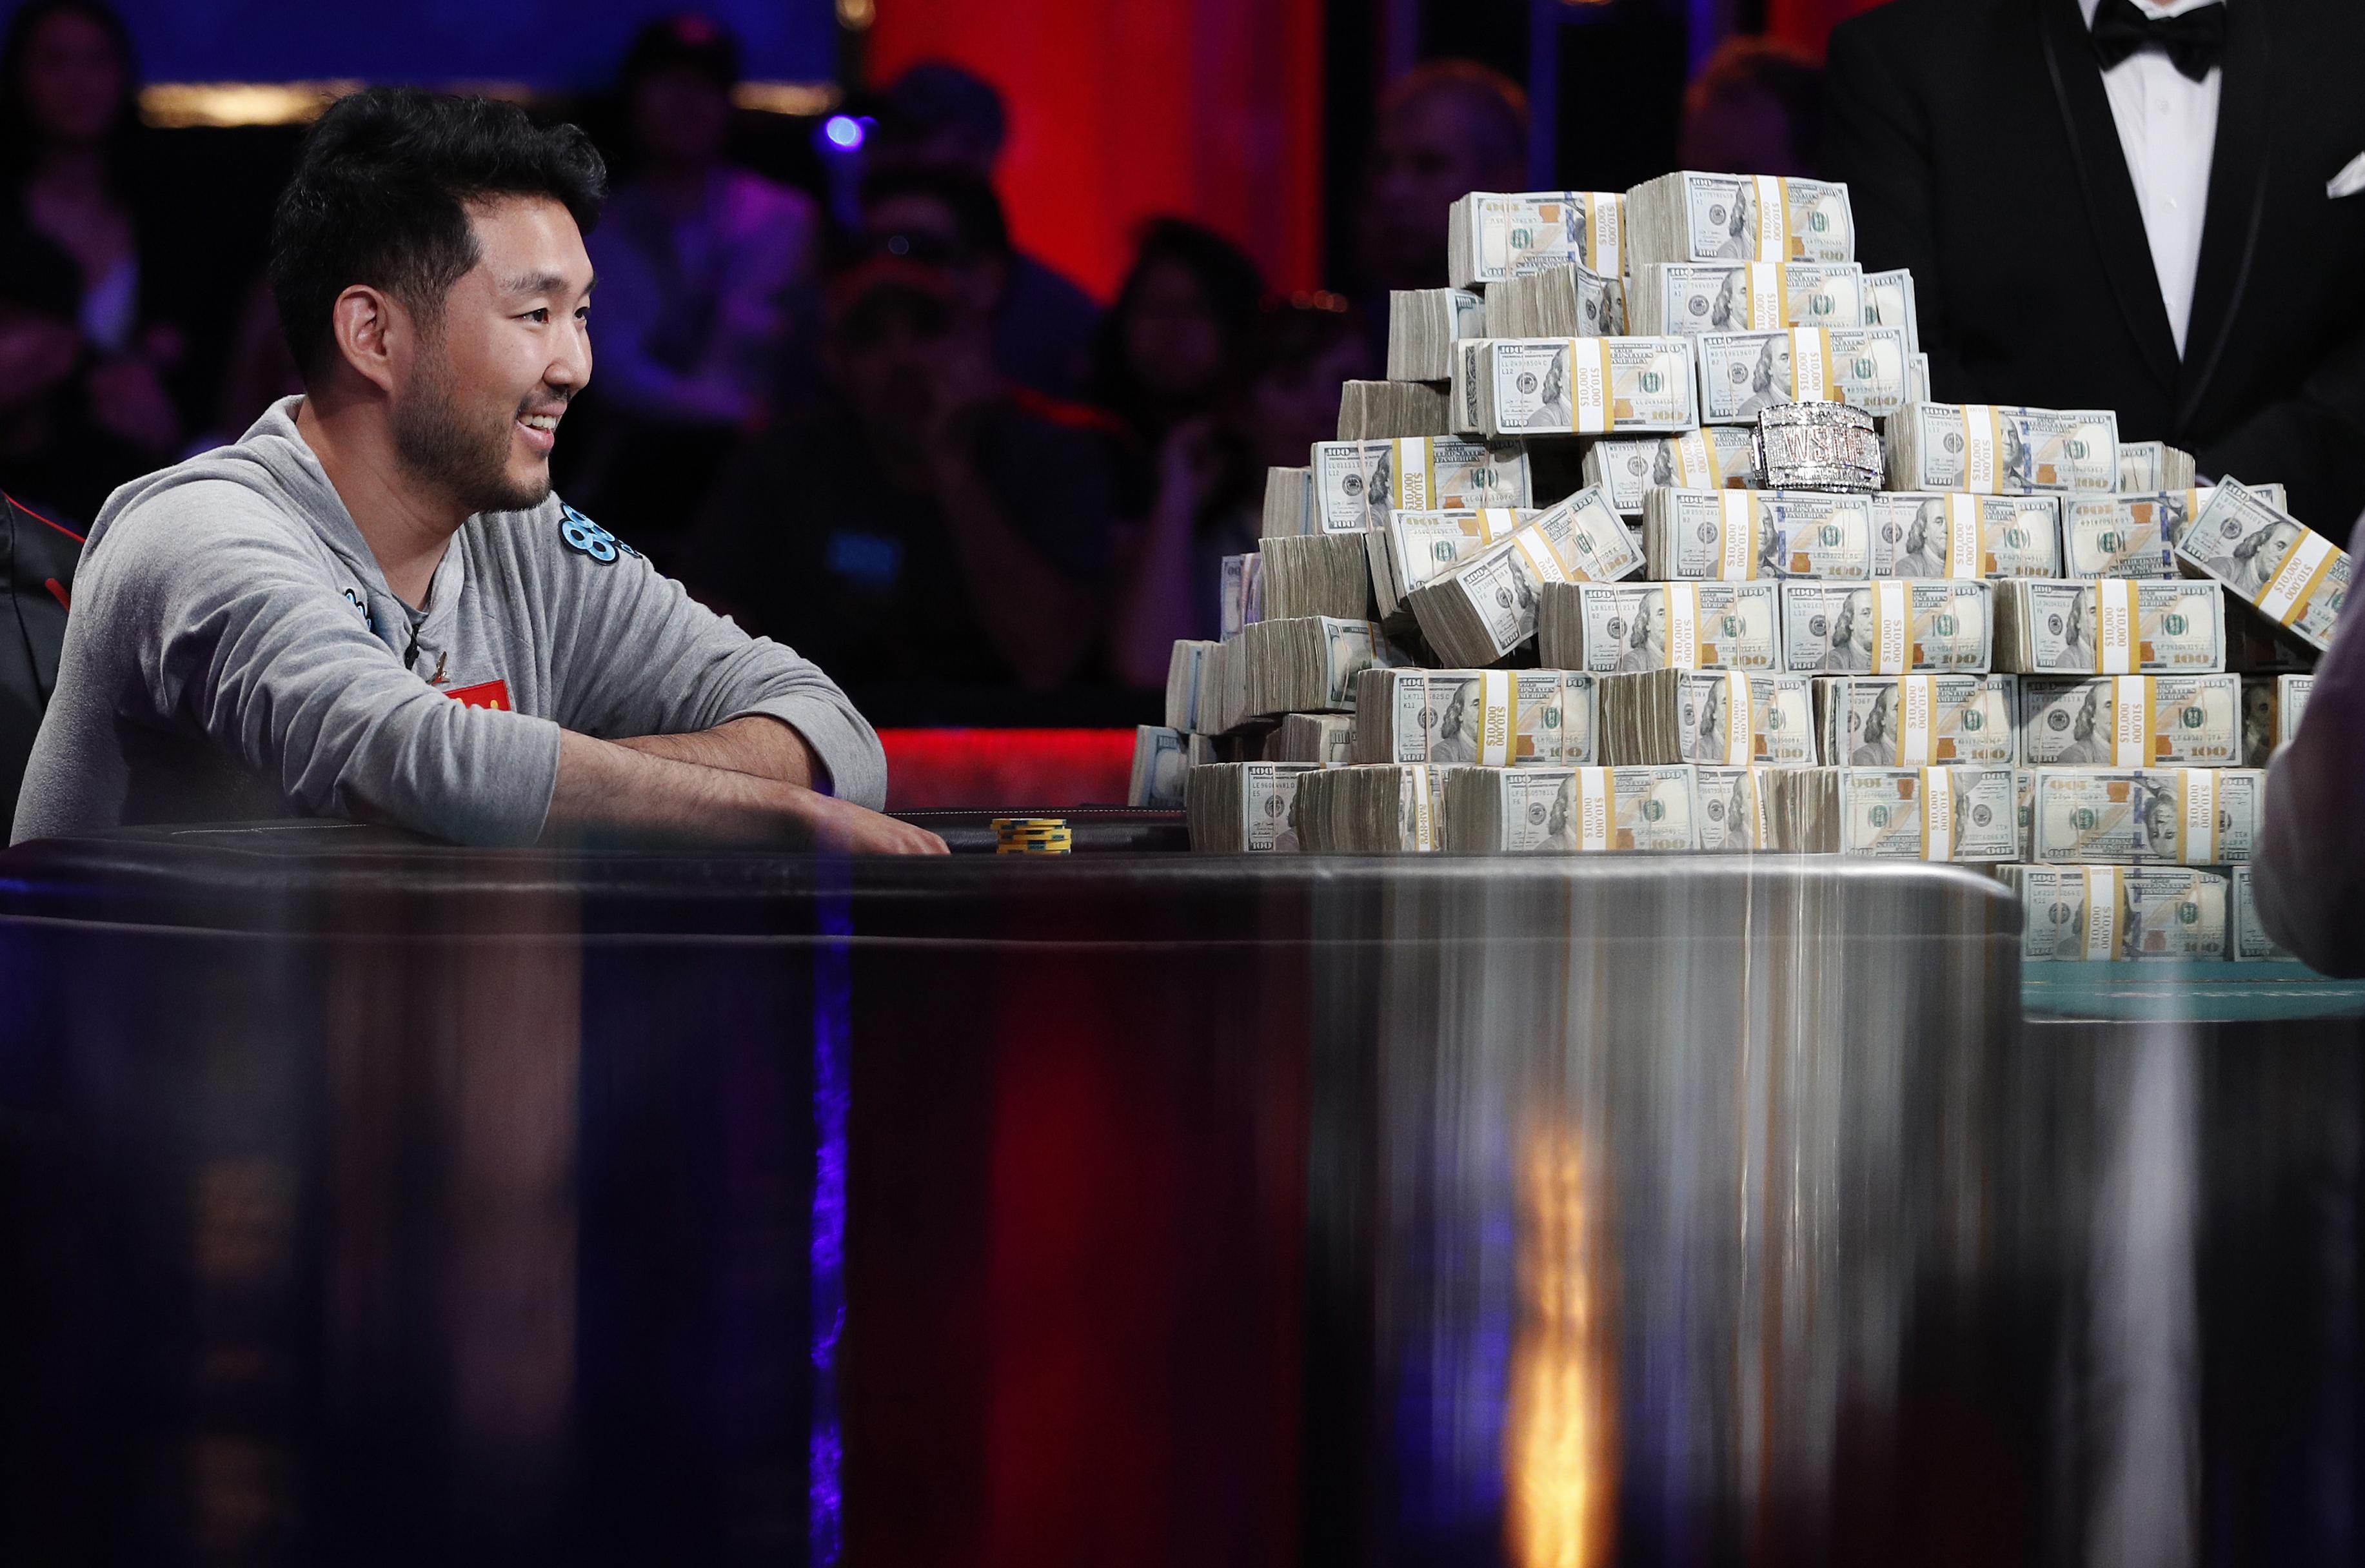 John cynn claims world series of poker title wins 8 8m the spokesman review - Final table world series of poker ...